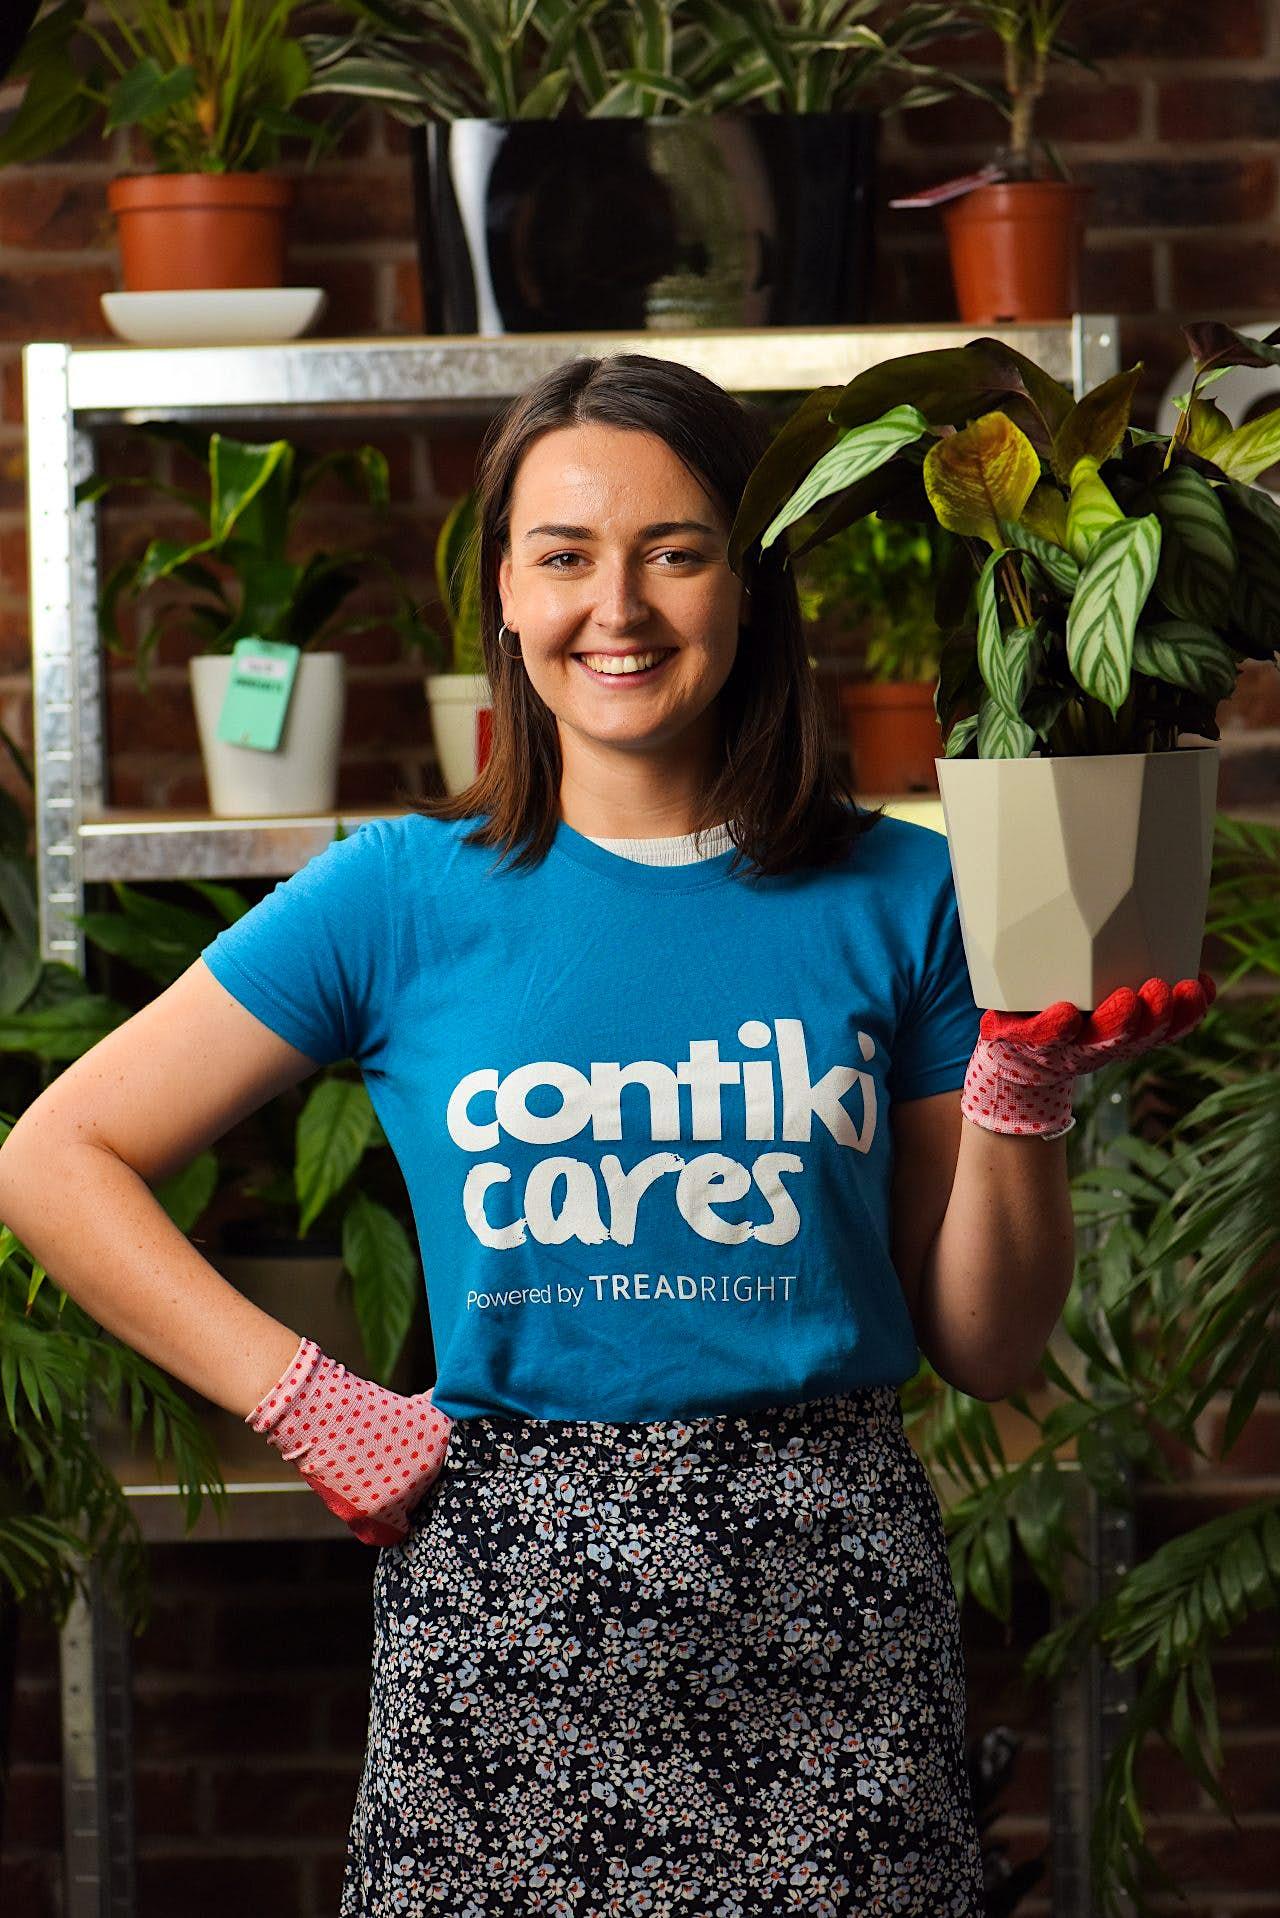 Travel News - Contiki Cares